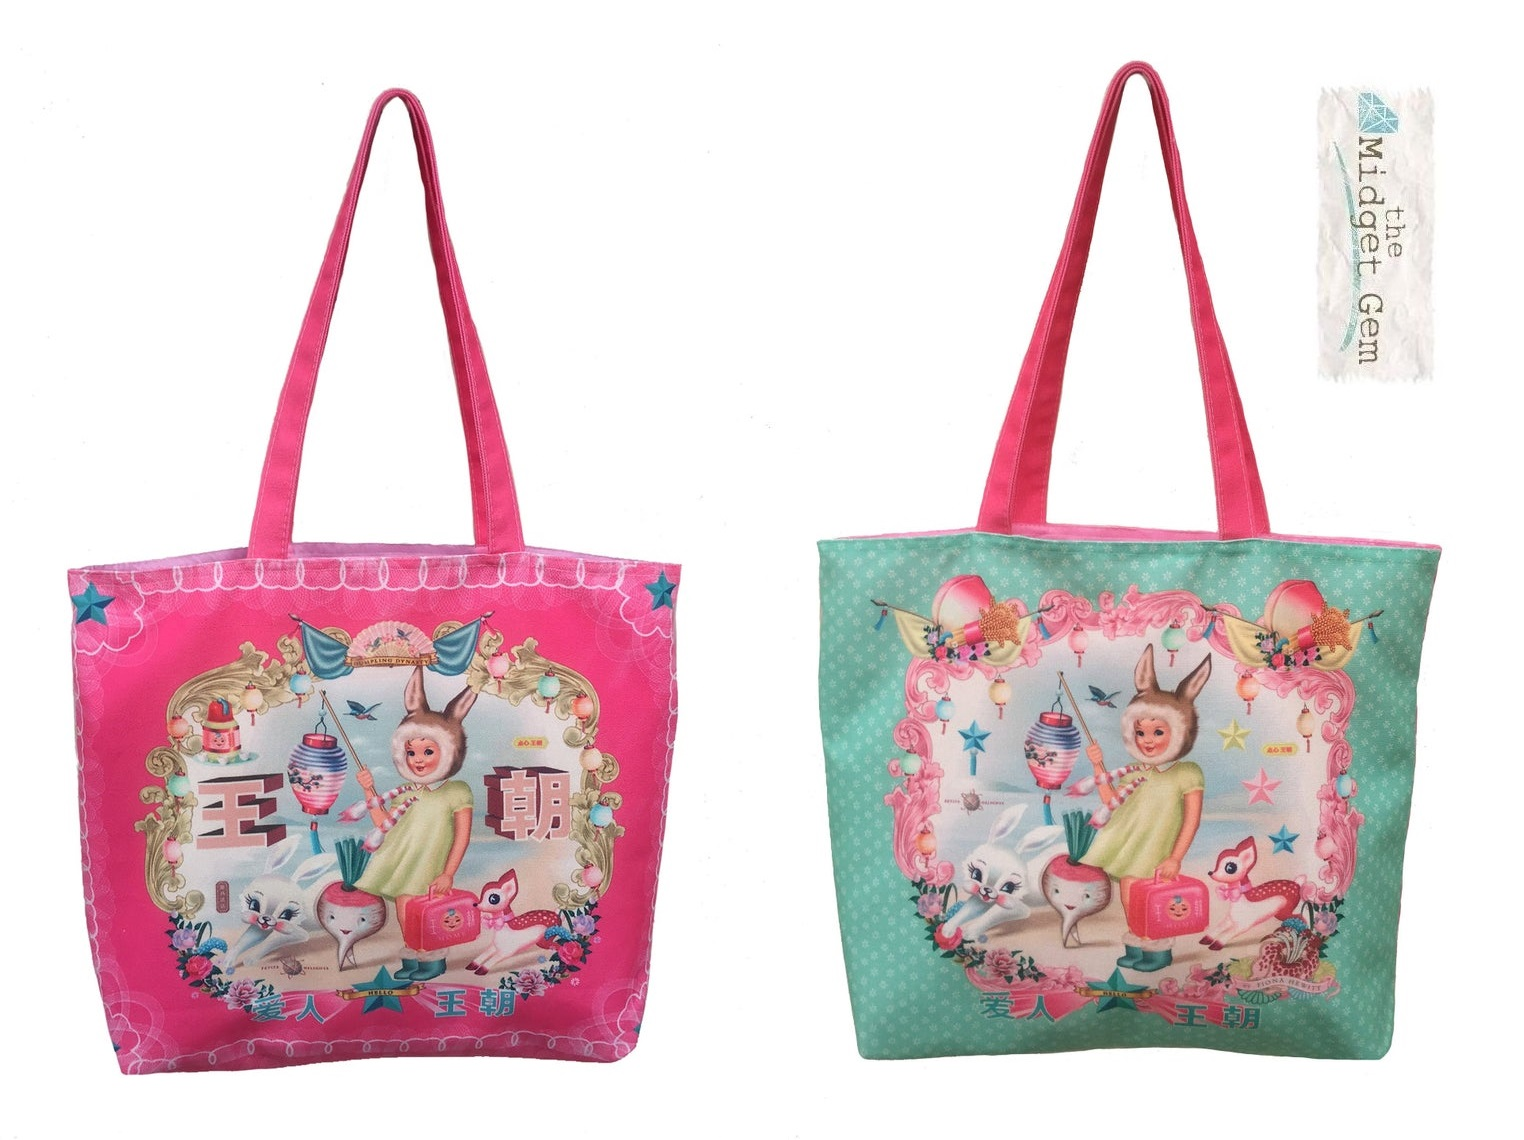 Chinese Lantern Girl - Shopper/Tote Bag - Pink Canvas - Fiona Hewitt